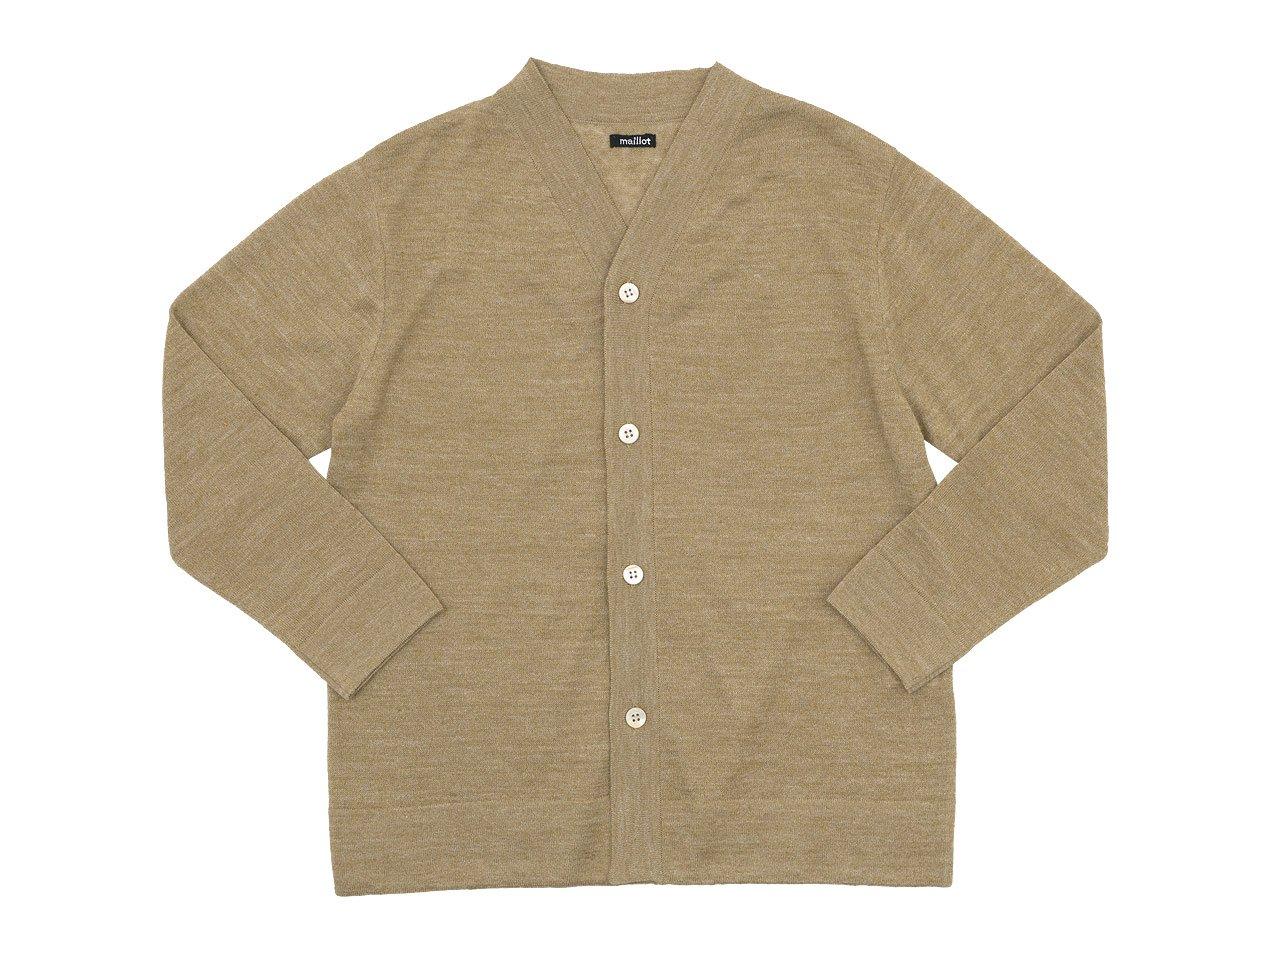 maillot mature summer cardigan BEIGE